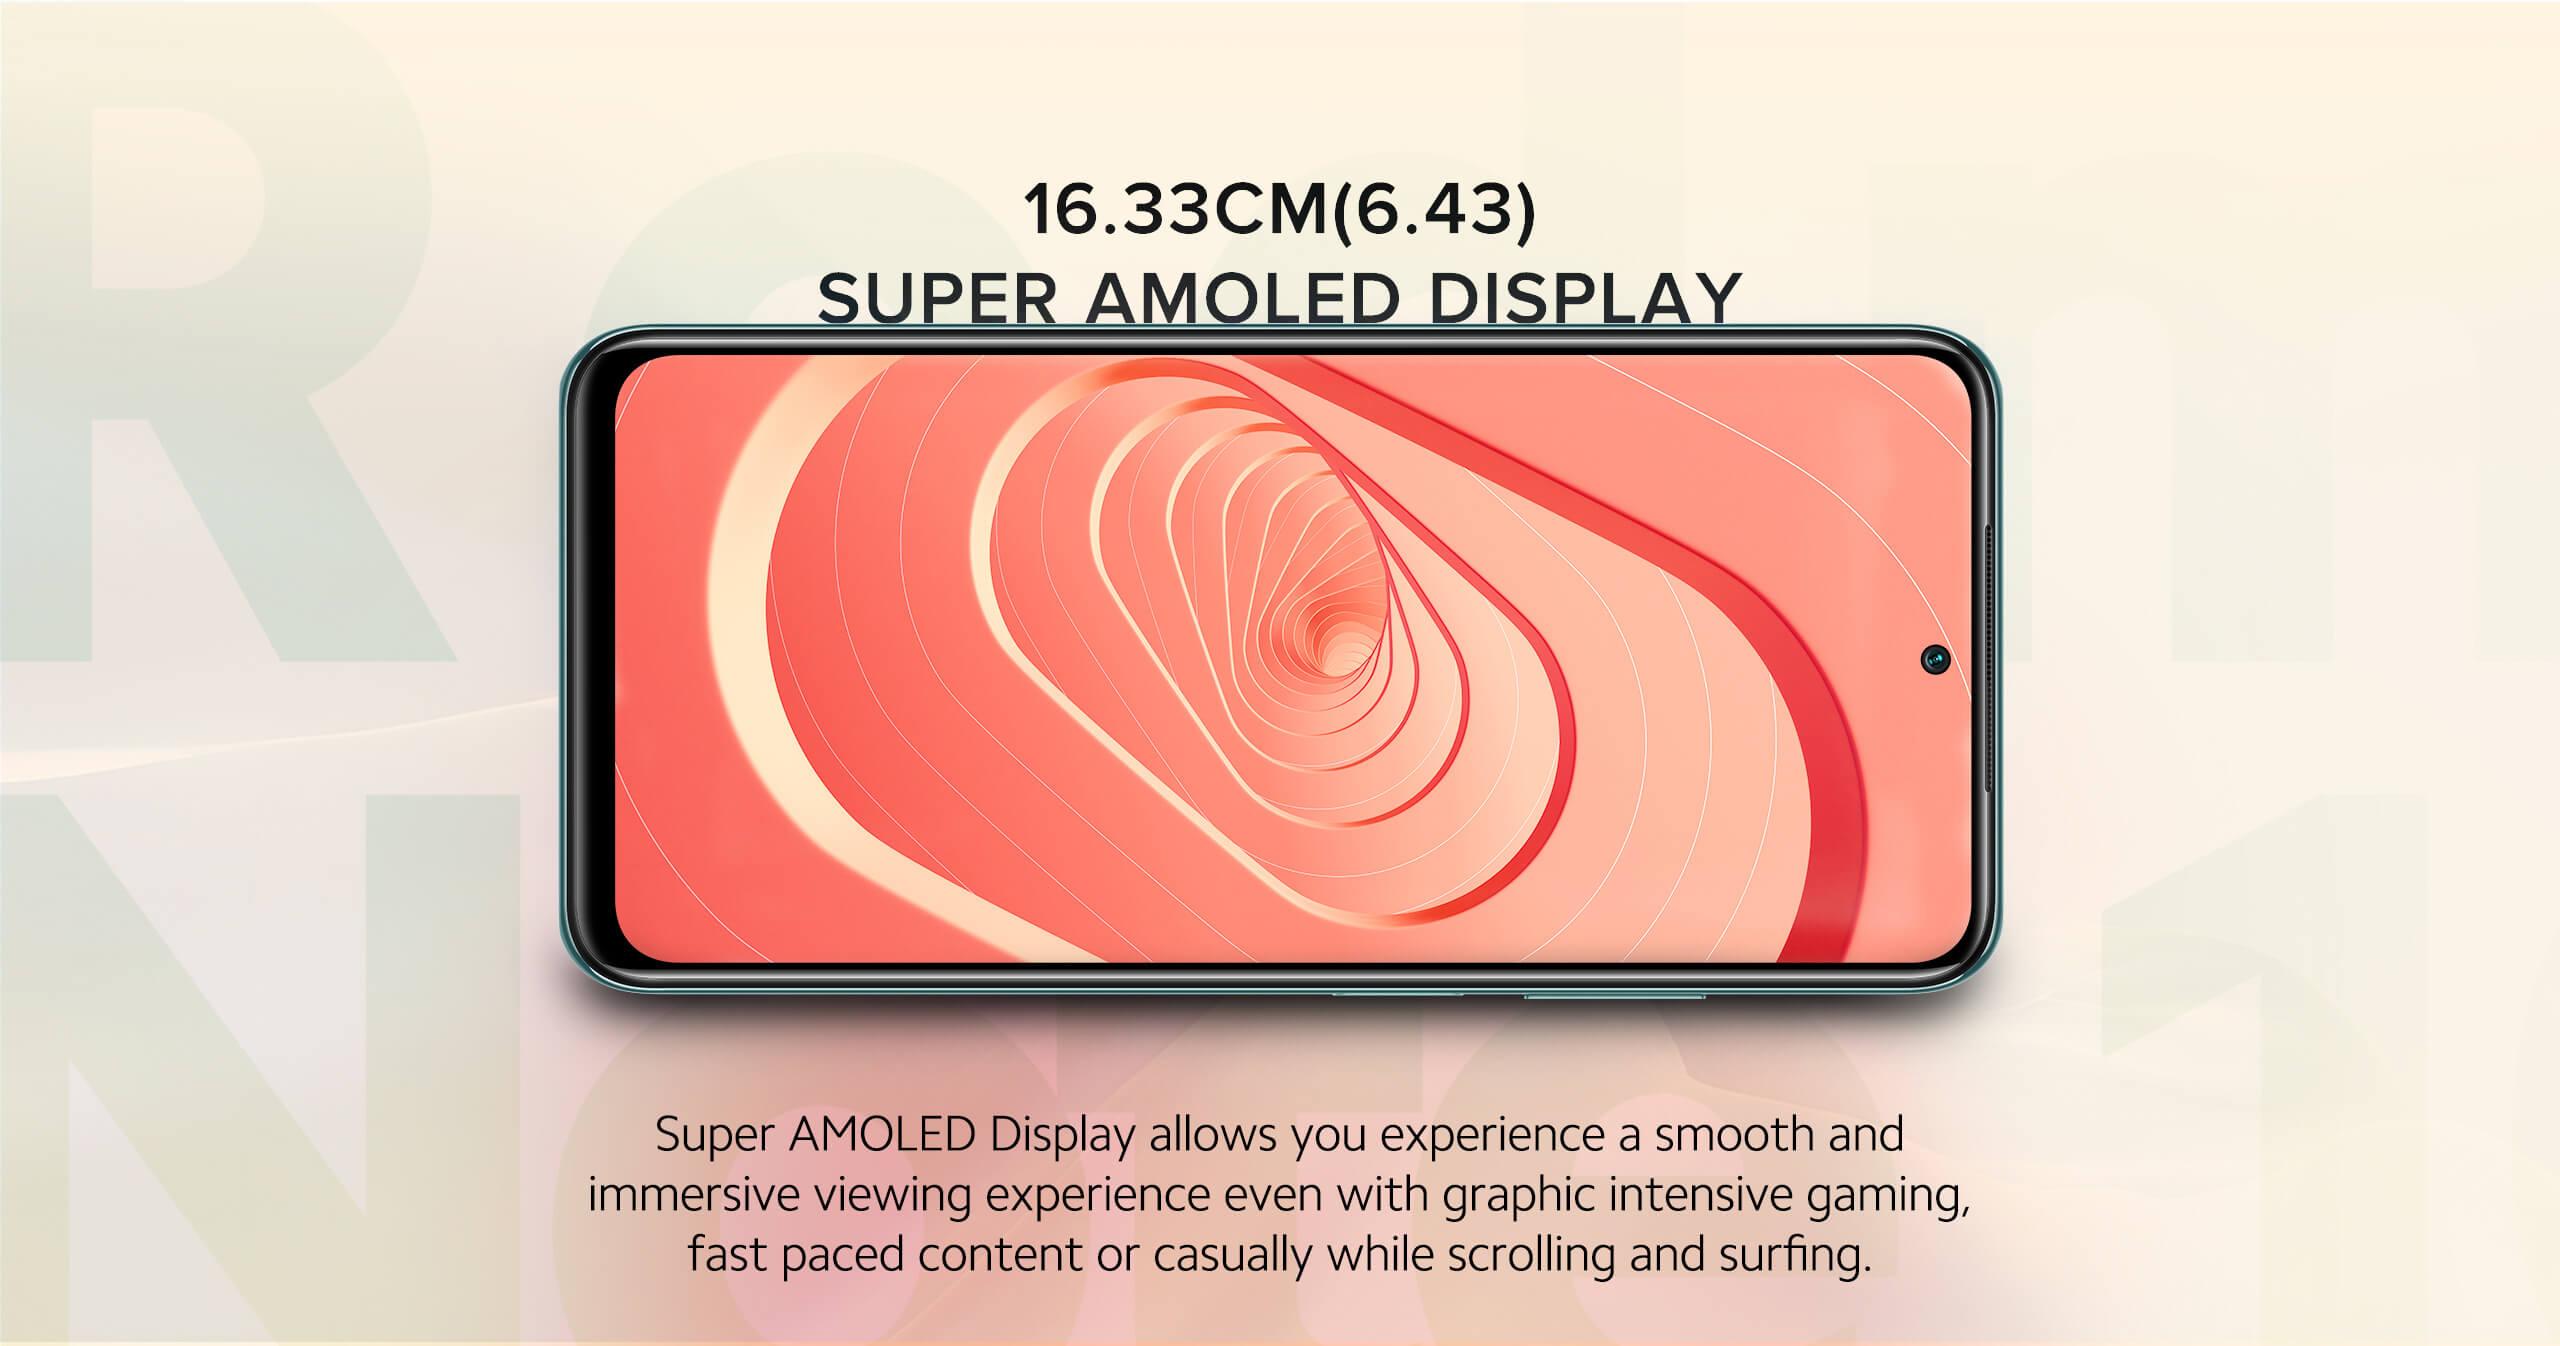 Redmi Note 10 super amoled